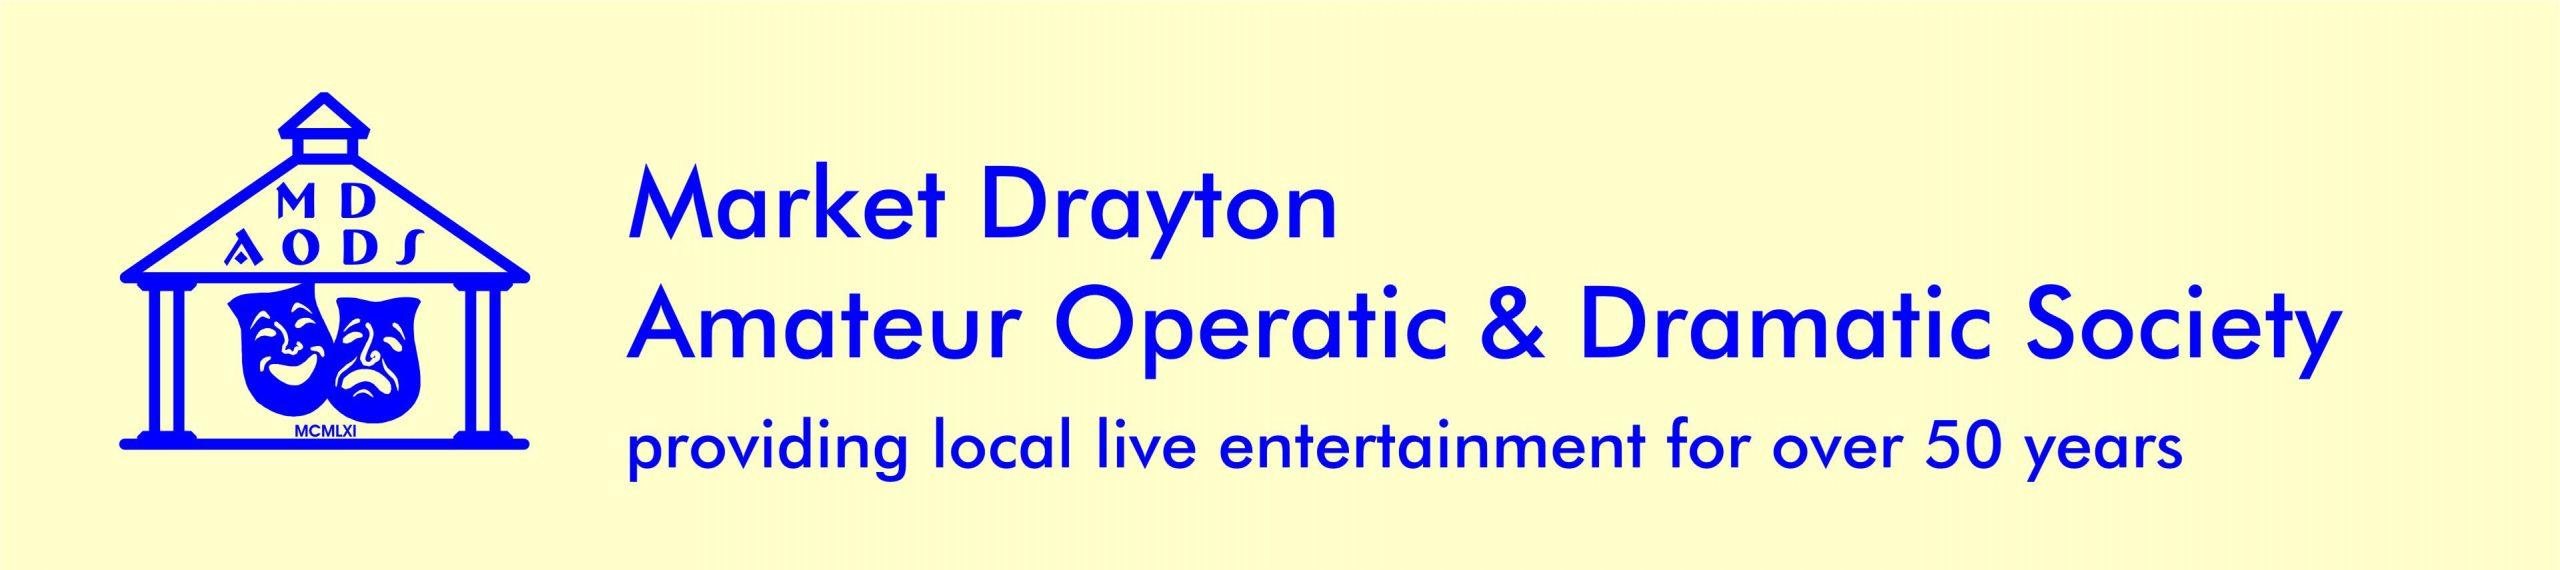 M.D.A.O.D.S – Market Drayton Amdrams